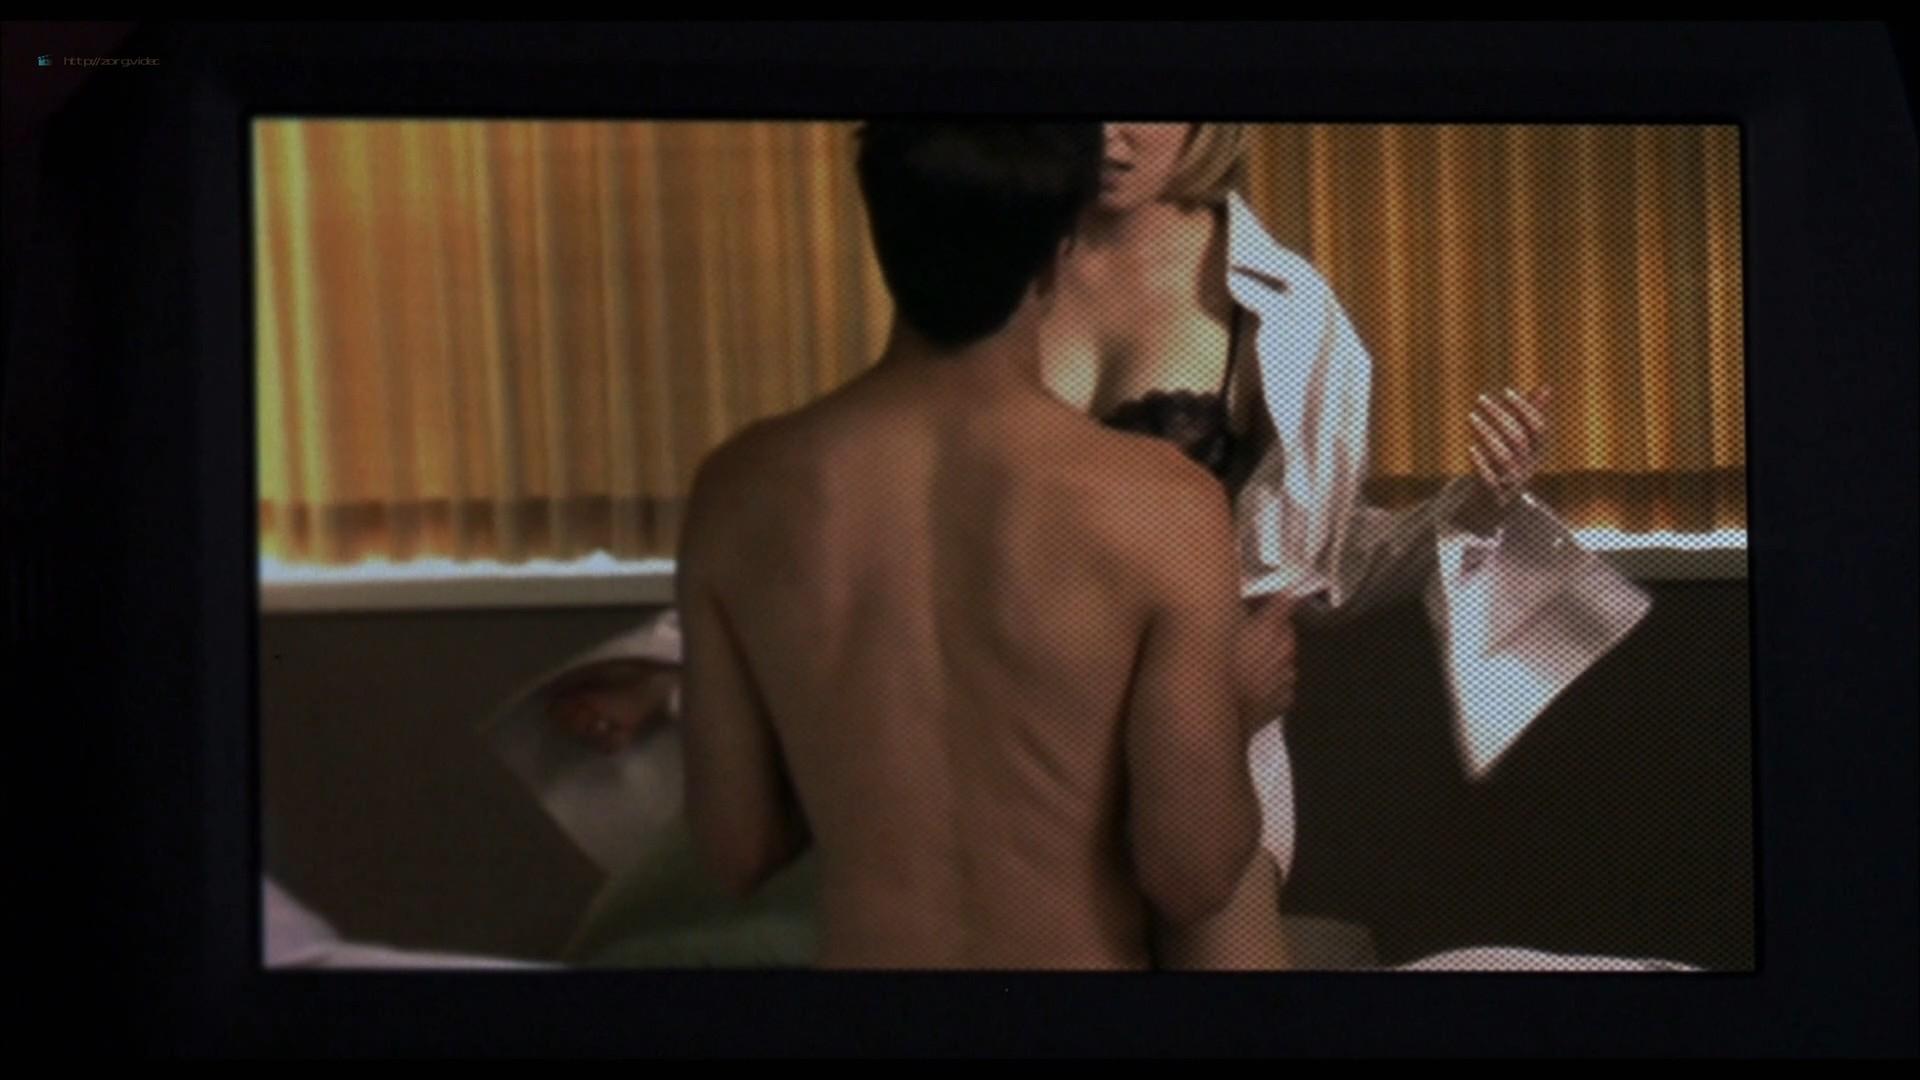 Elizabeth Banks hot in lingerie Jessica Alba and Sarah Howard hot - Meet Bill (2007) HD 1080p BluRay (20)